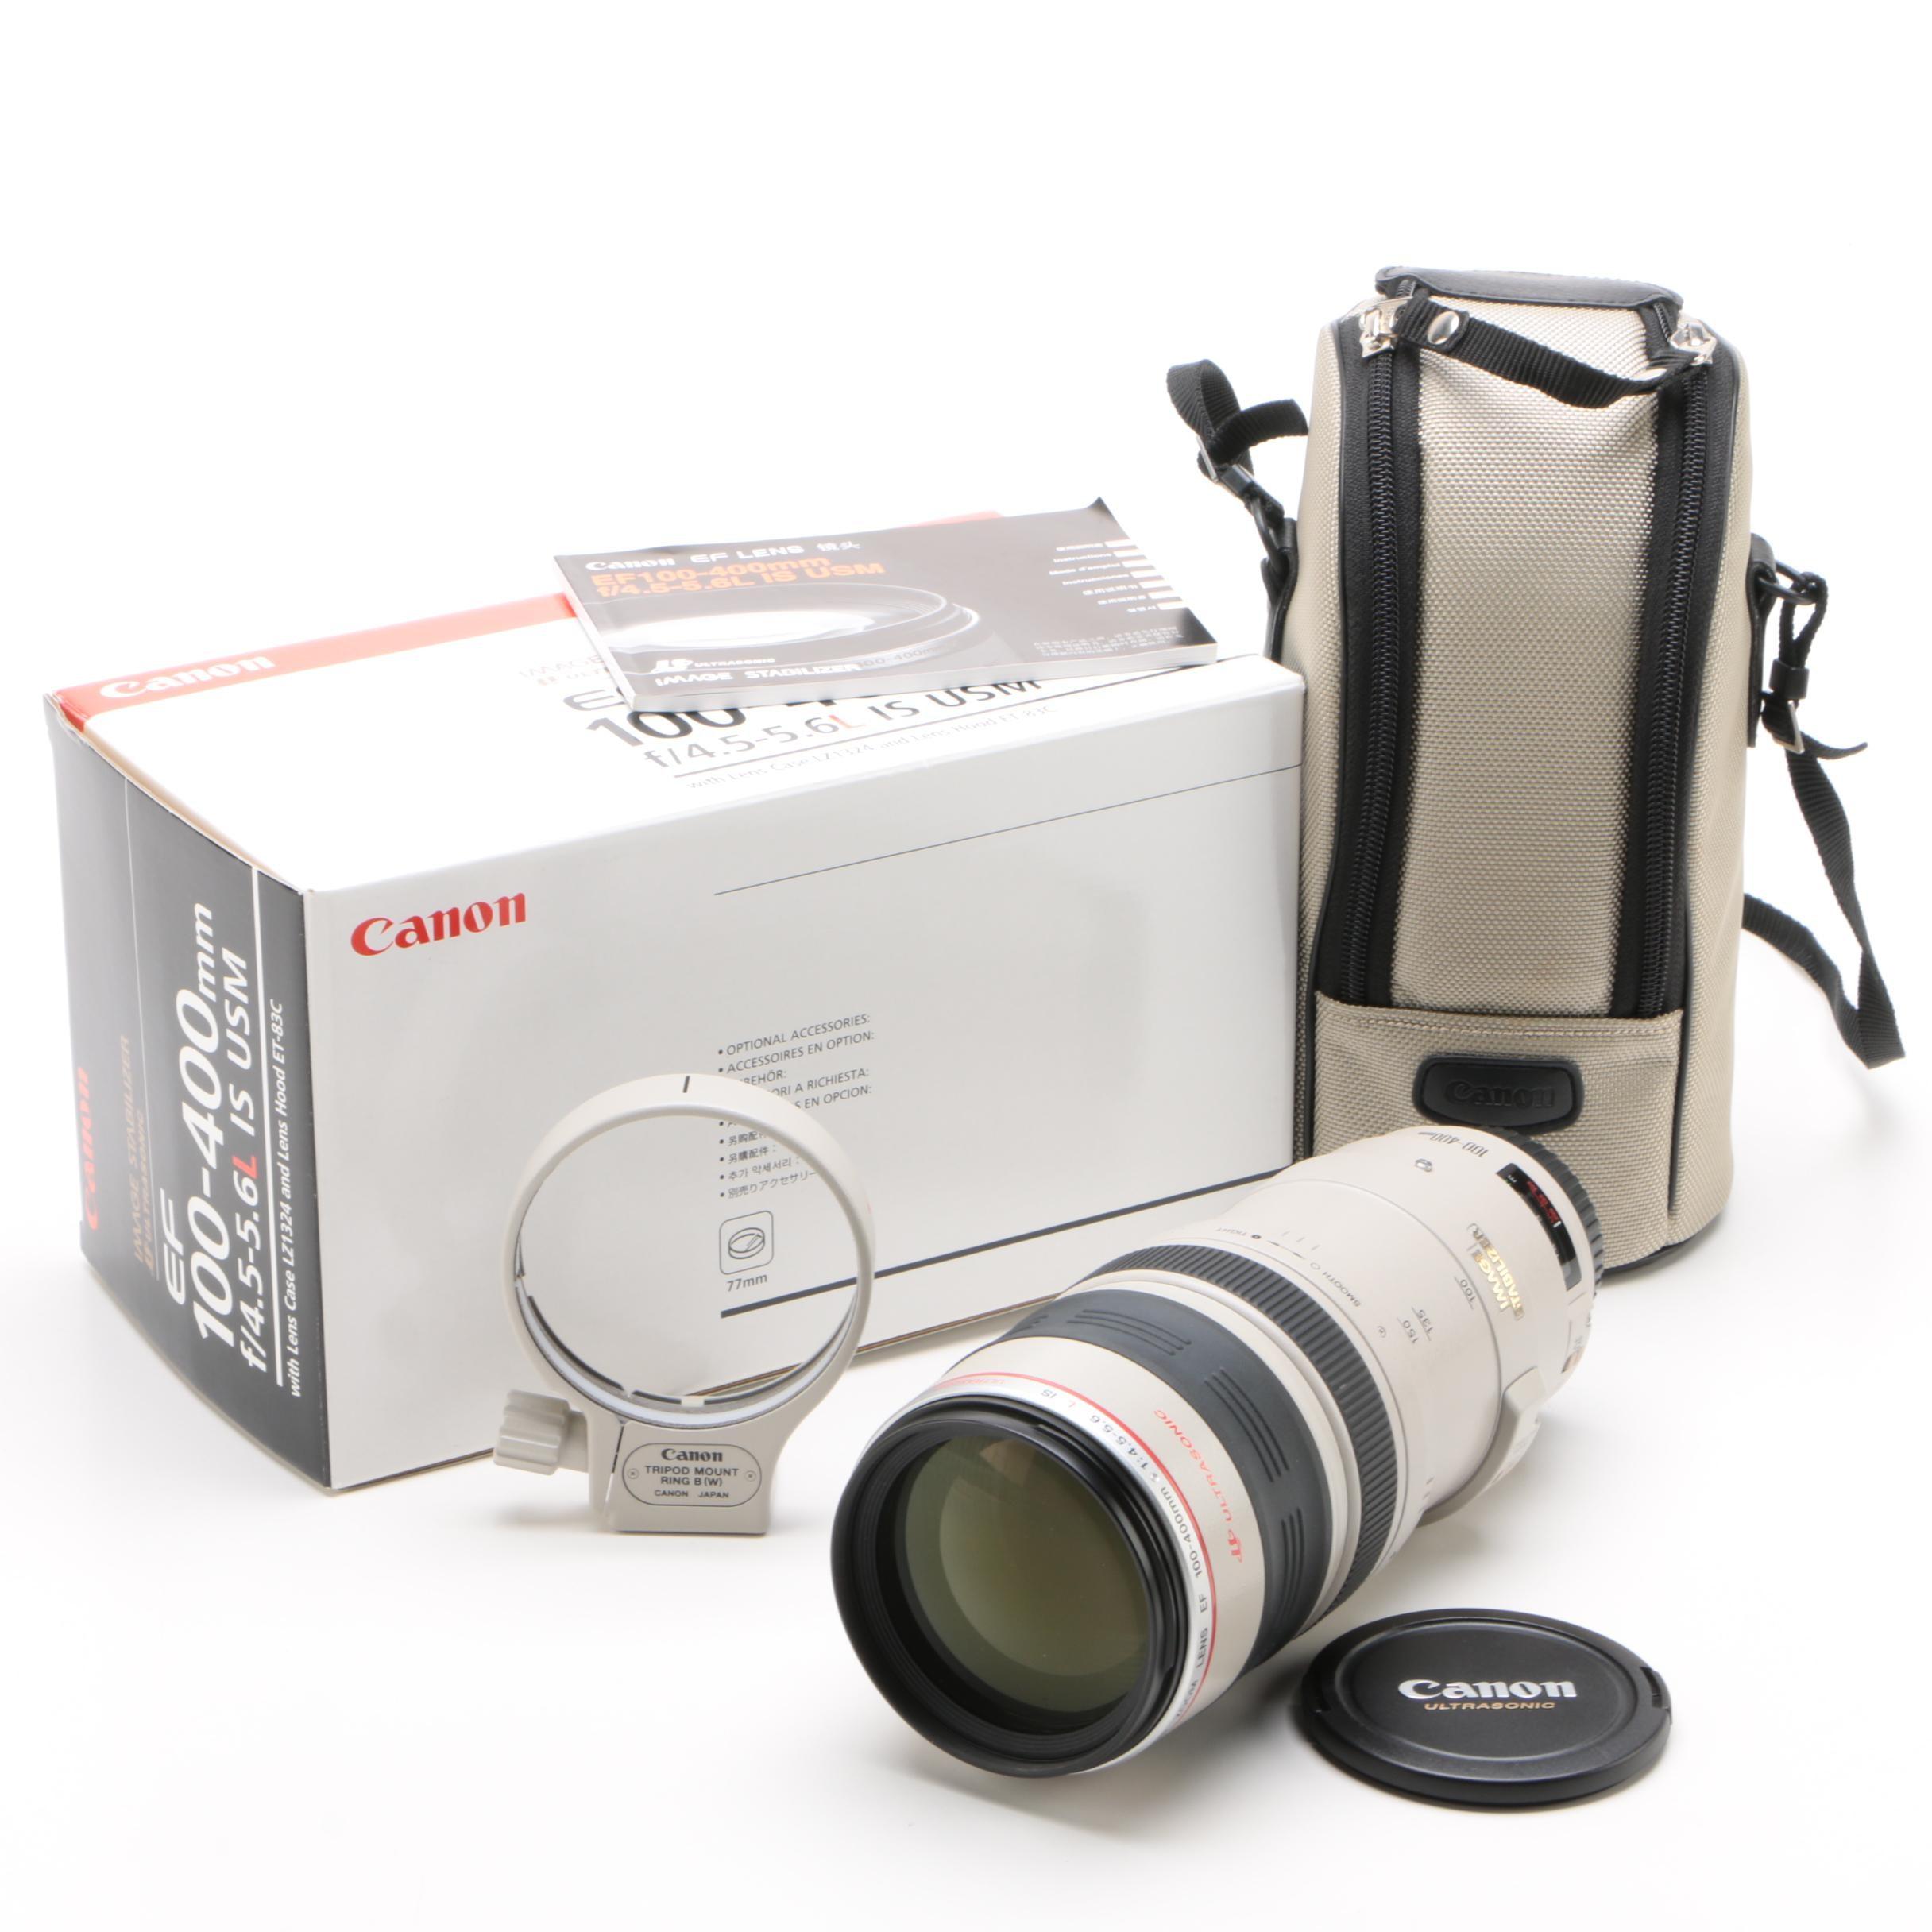 Canon EF 100-400mm f/4.5-5.6L Ultrasonic Macro Lens with Tripod Mount